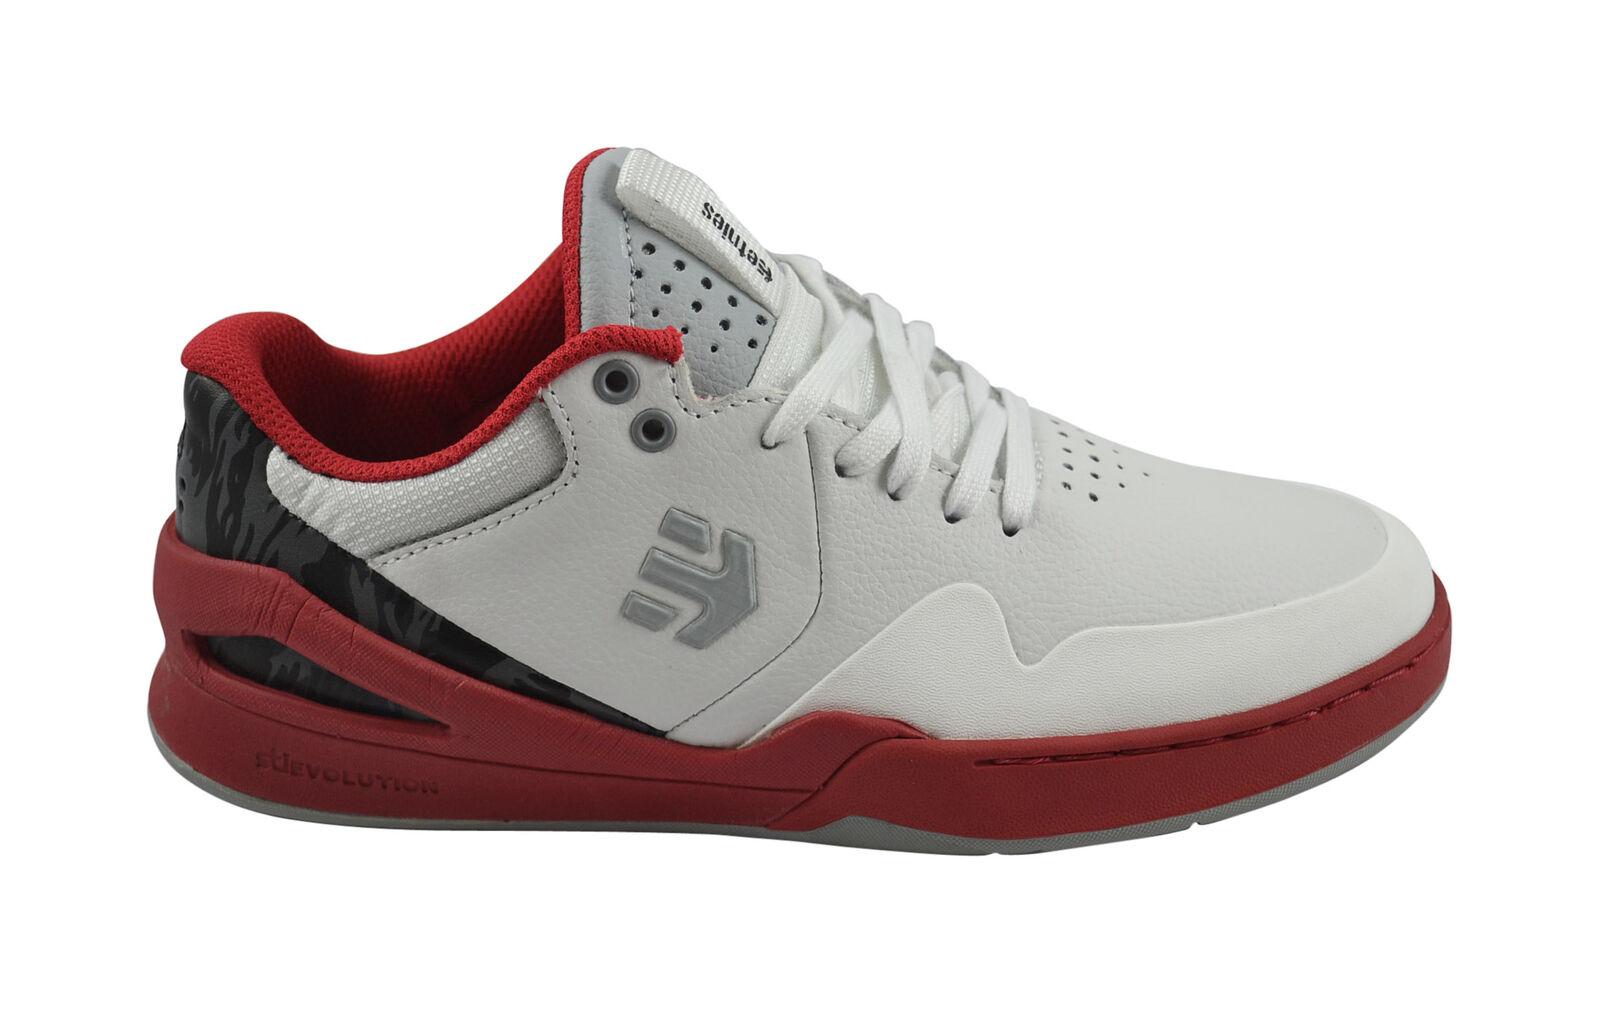 Etnies Marana Marana Marana E-Lite Blanco Gris Rojo Skater Sneaker/Sneaker Elite weiß a540d7